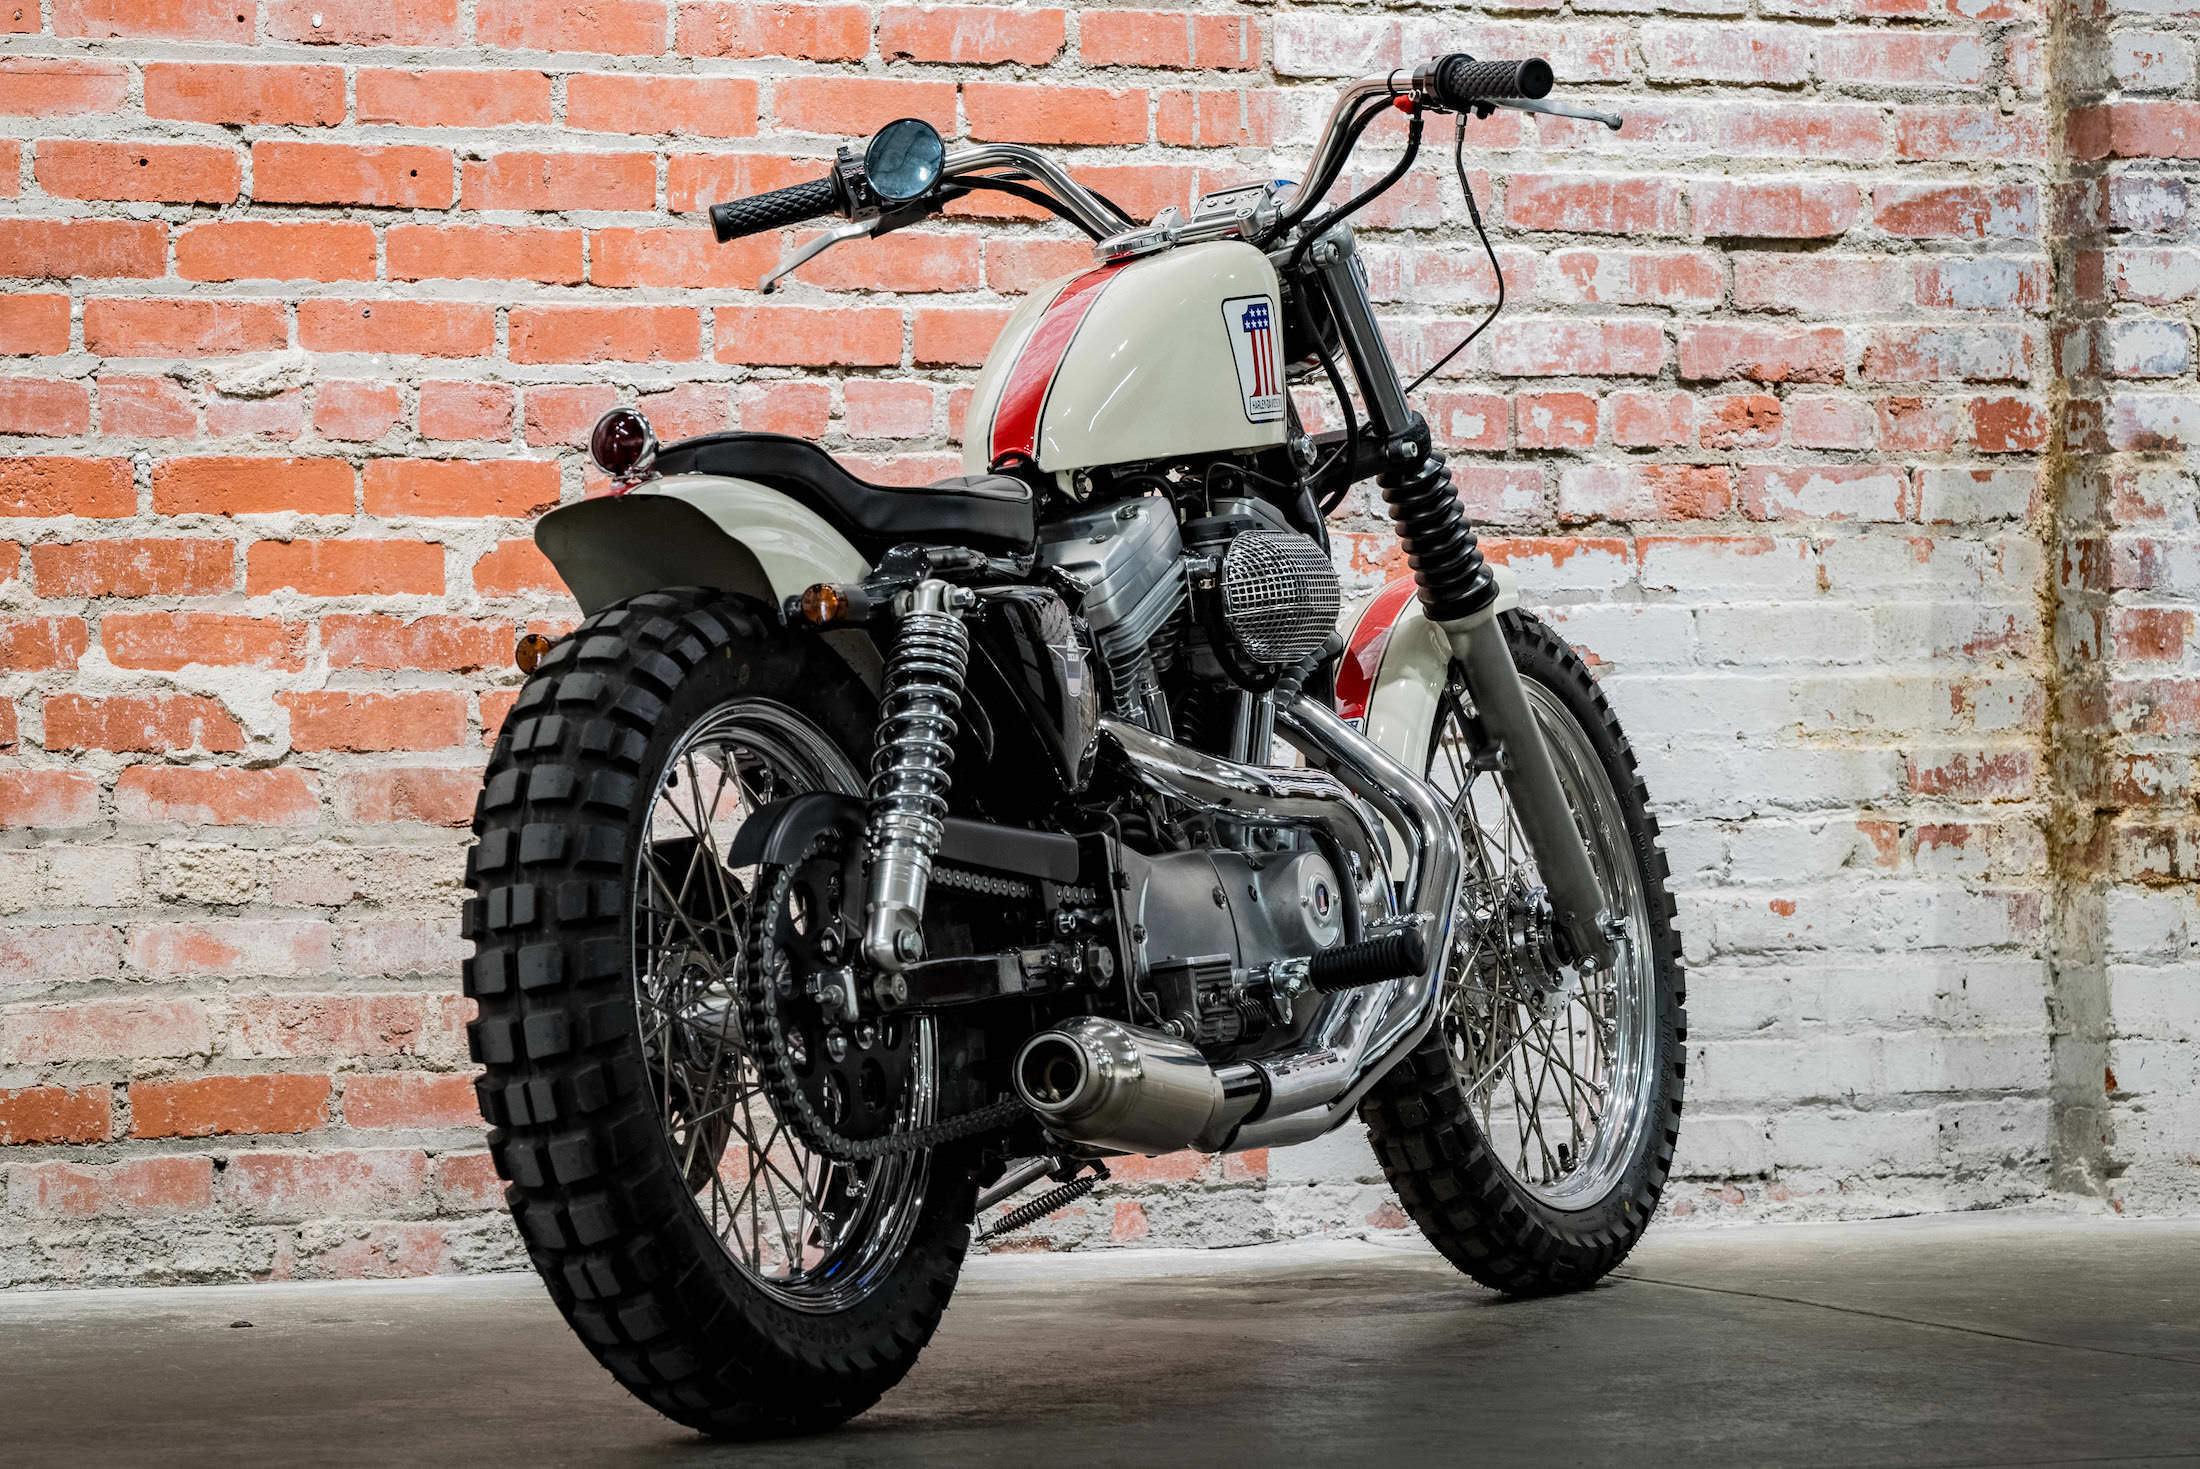 Ebay Motors Motorcycles >> Hageman Motorcycles Harley-Davidson XL1200 Sportster Custom